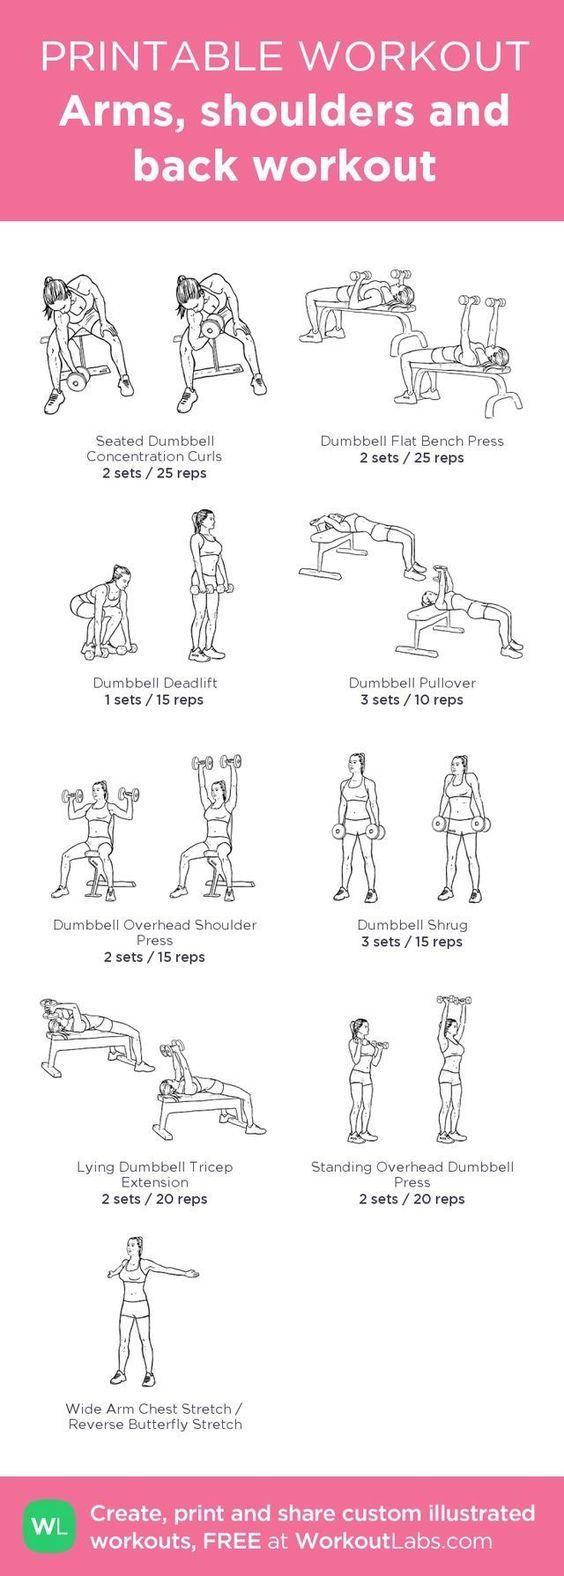 Arm Workout   Shoulder Workout   Back Workout   Upper Body Workout   Busy Woman Workout #homeworkout #healthylifestyle #upperbodyworkout